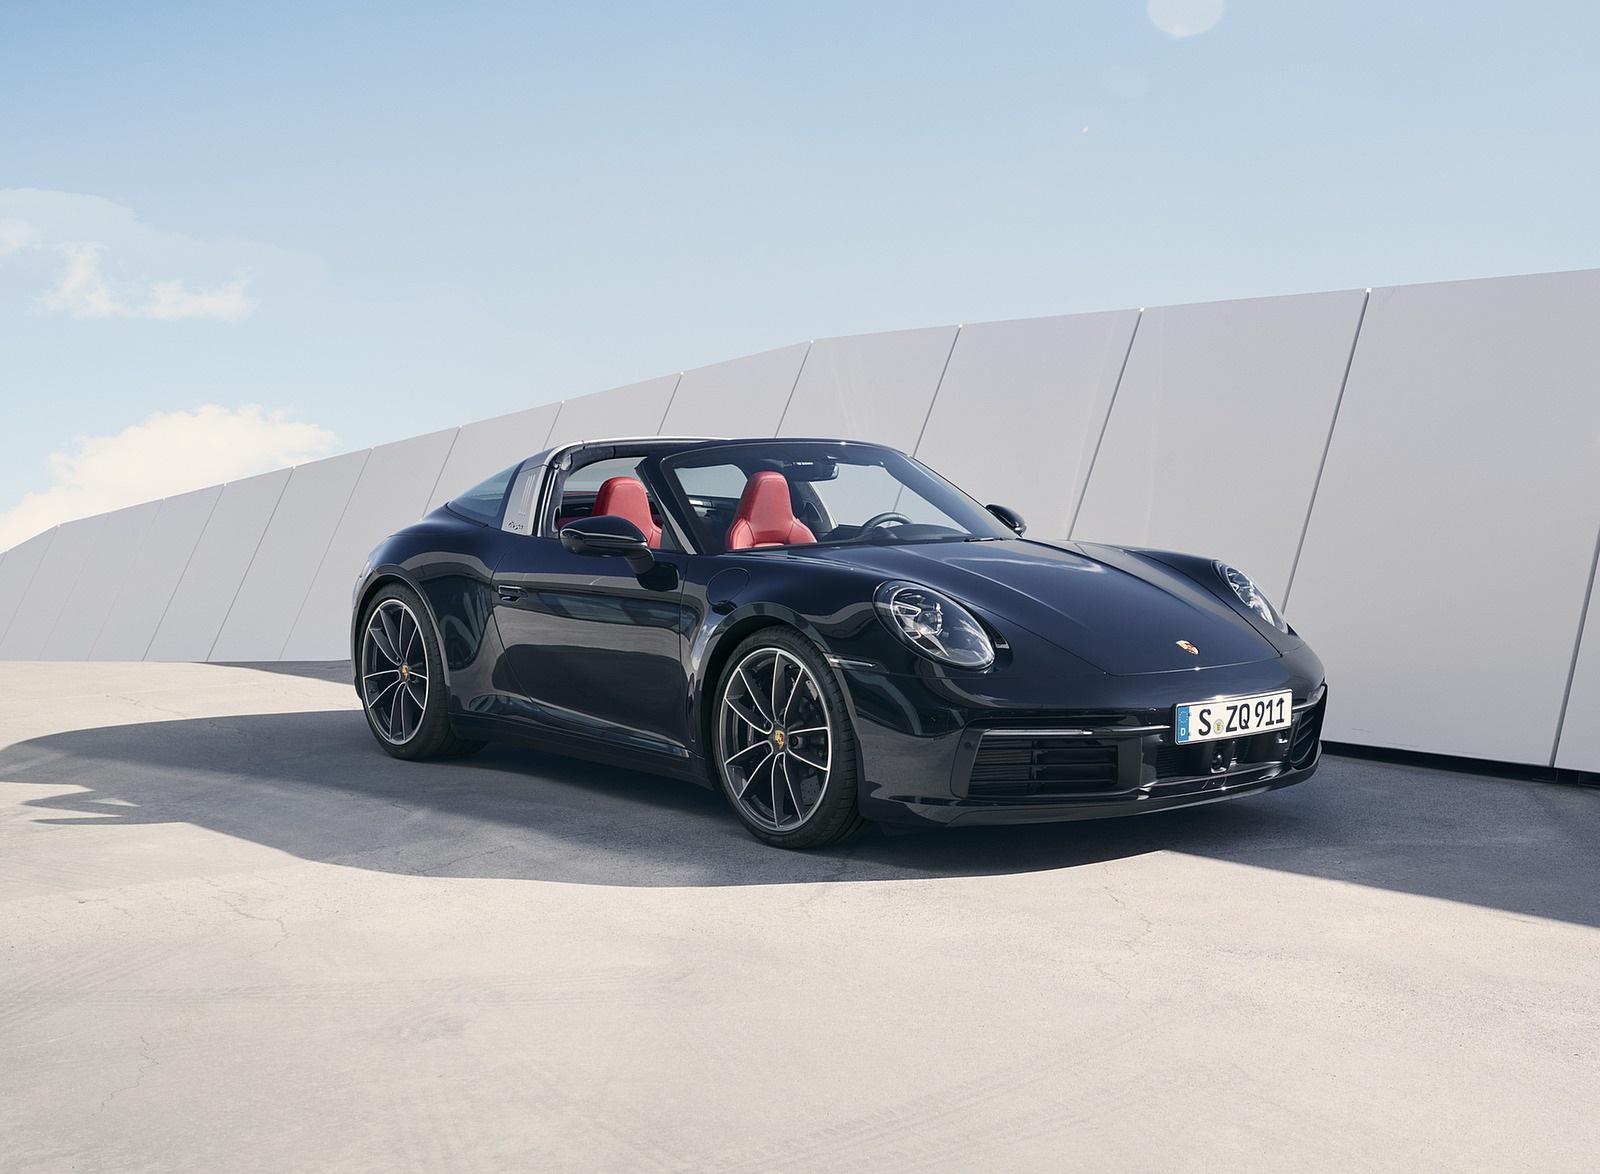 2021 Porsche 911 Targa 4S Front Three-Quarter Wallpapers (1)